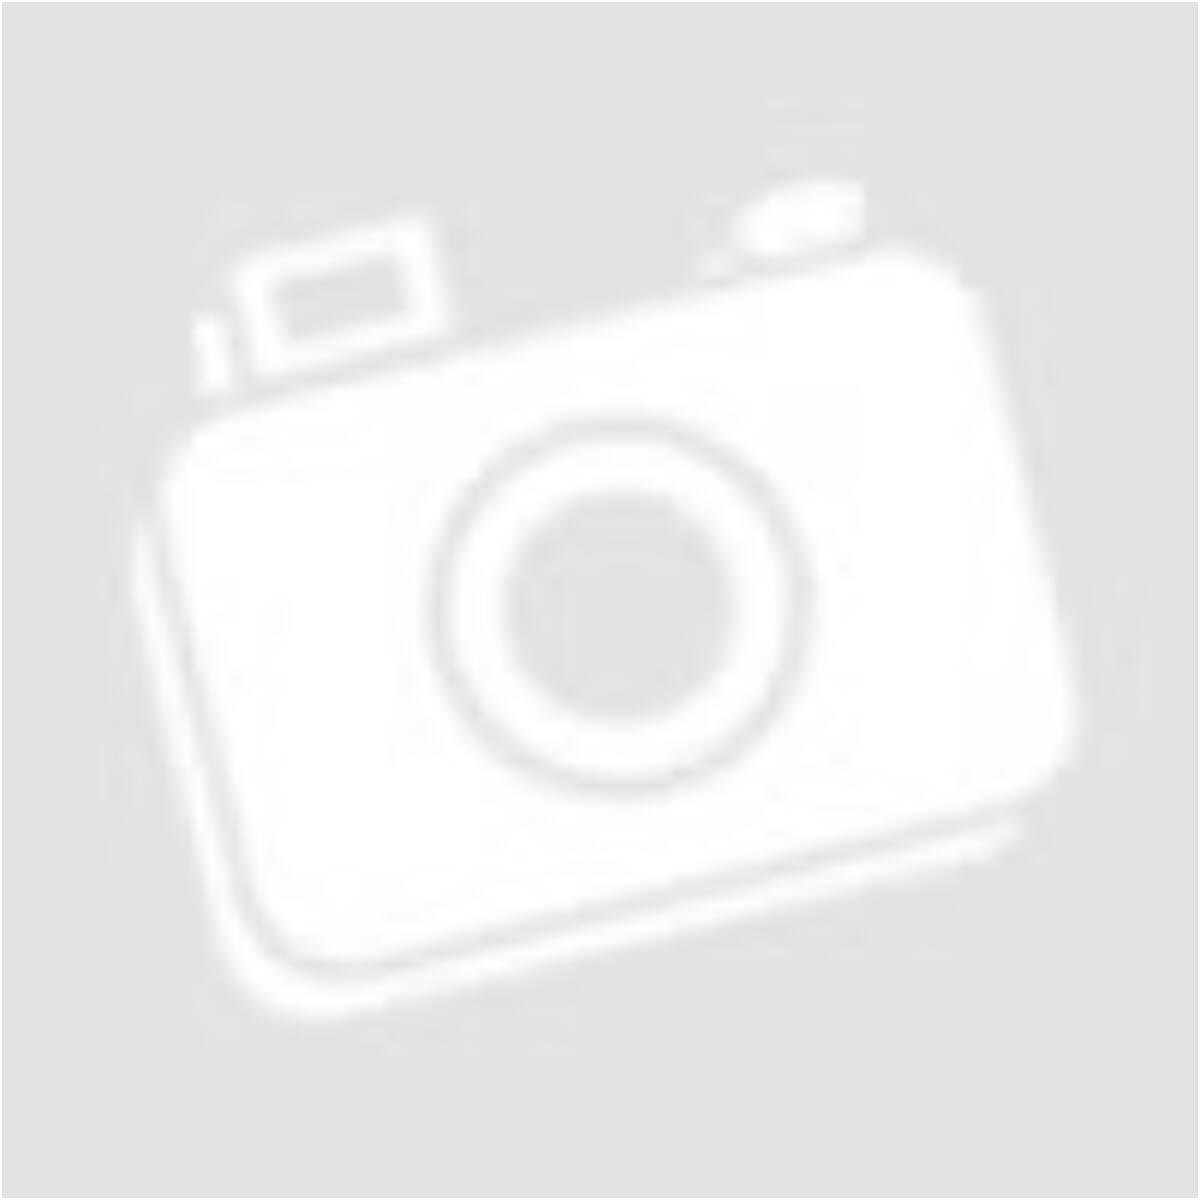 fc6645da96 Férfi sportos télikabát #5306 - piros - Télikabátok